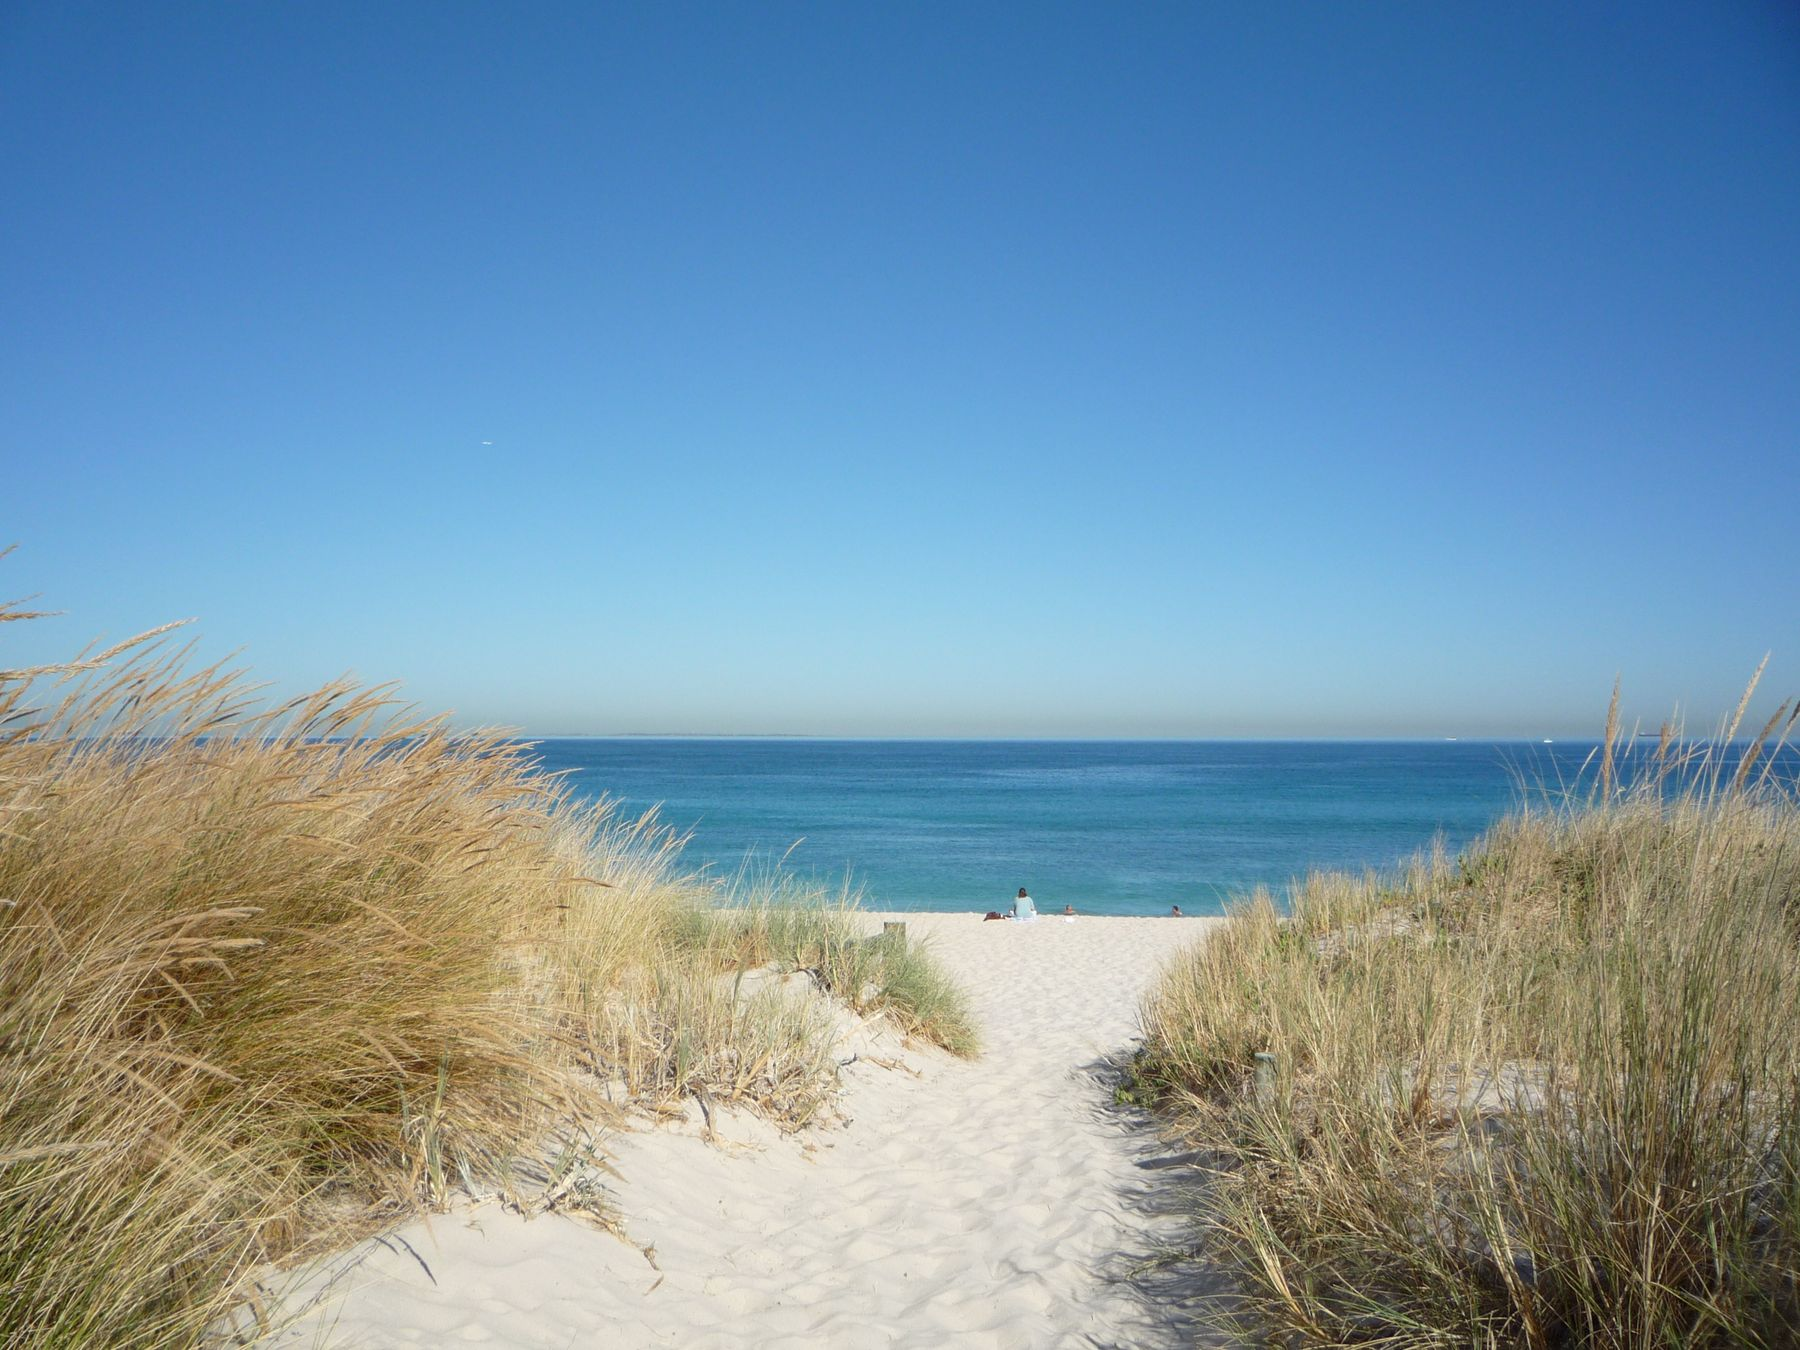 A sandy bath between tall grass leading to South Beach, Australia